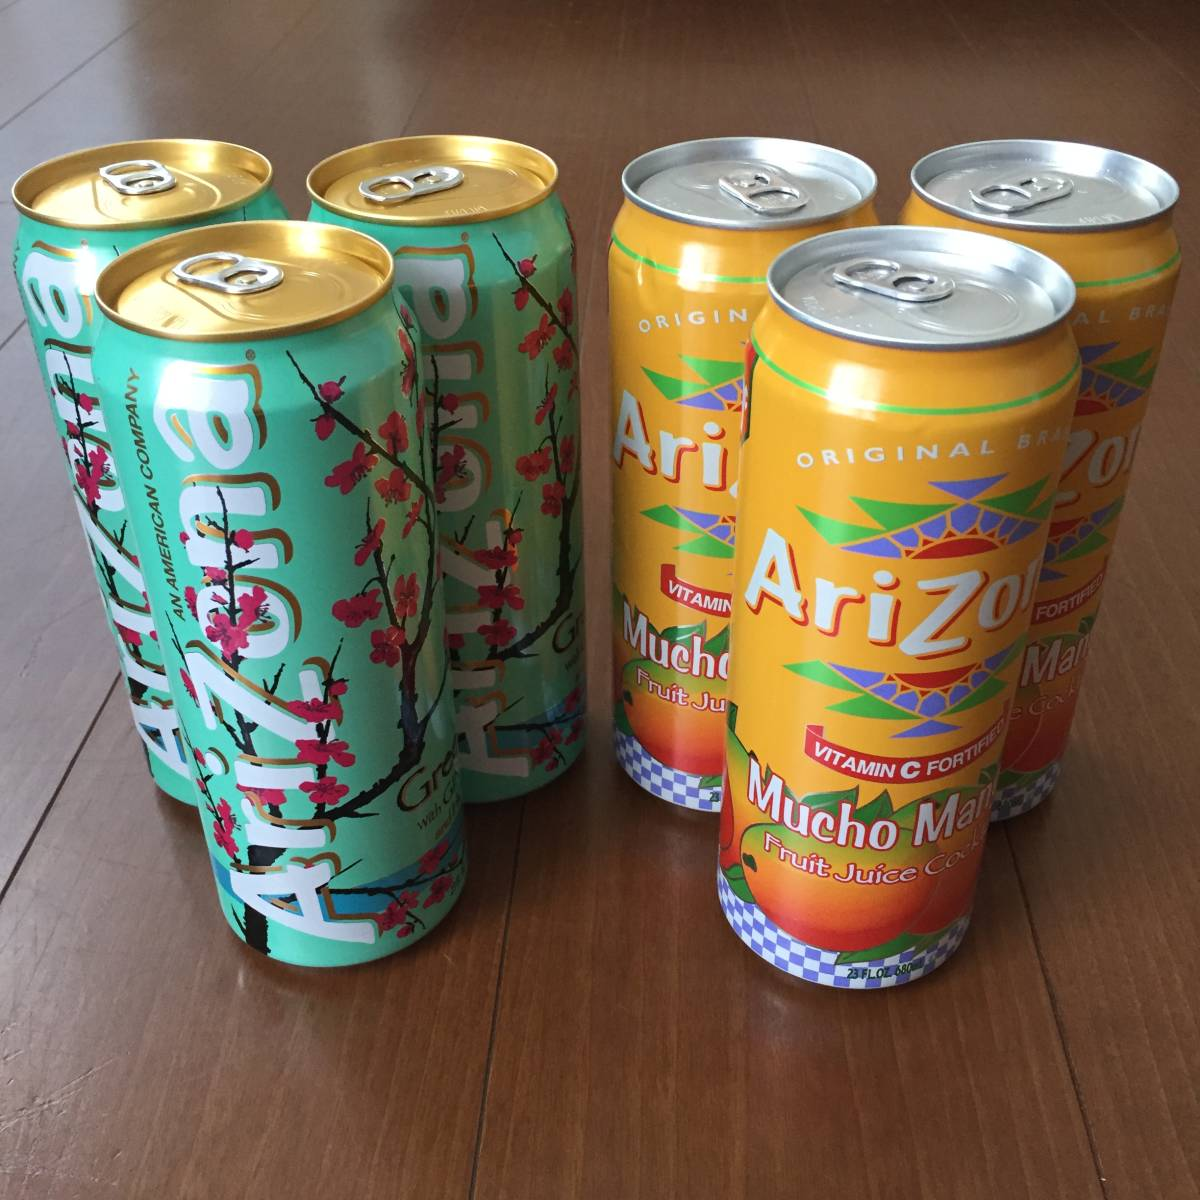 ARIZONA GREEN TEA GINSENG HONEY アリゾナ グリーン ティー ハワイ アメリカ 日本未発売 日本未入荷 海外限定 緑茶 レモンティ 680ml_画像1